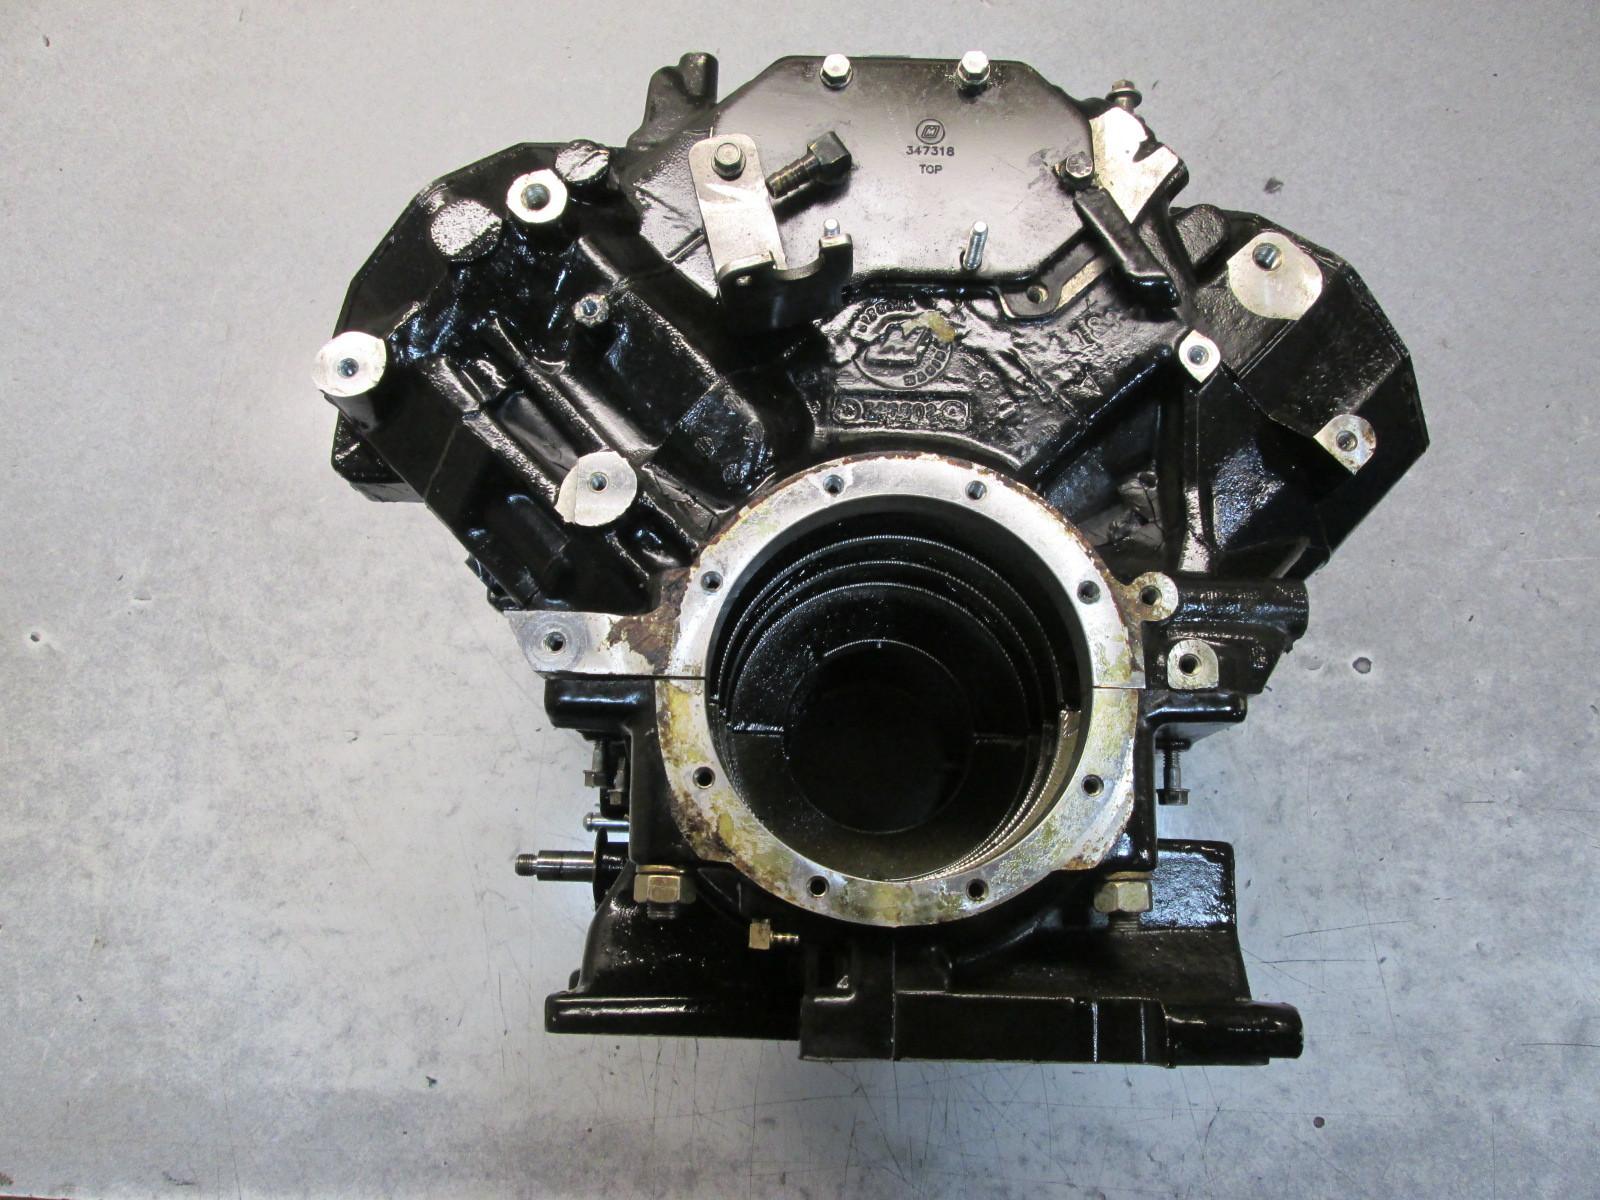 Captivating Onan Fuel Gauge Wiring Toyota Matrix Ignition Wiring ...